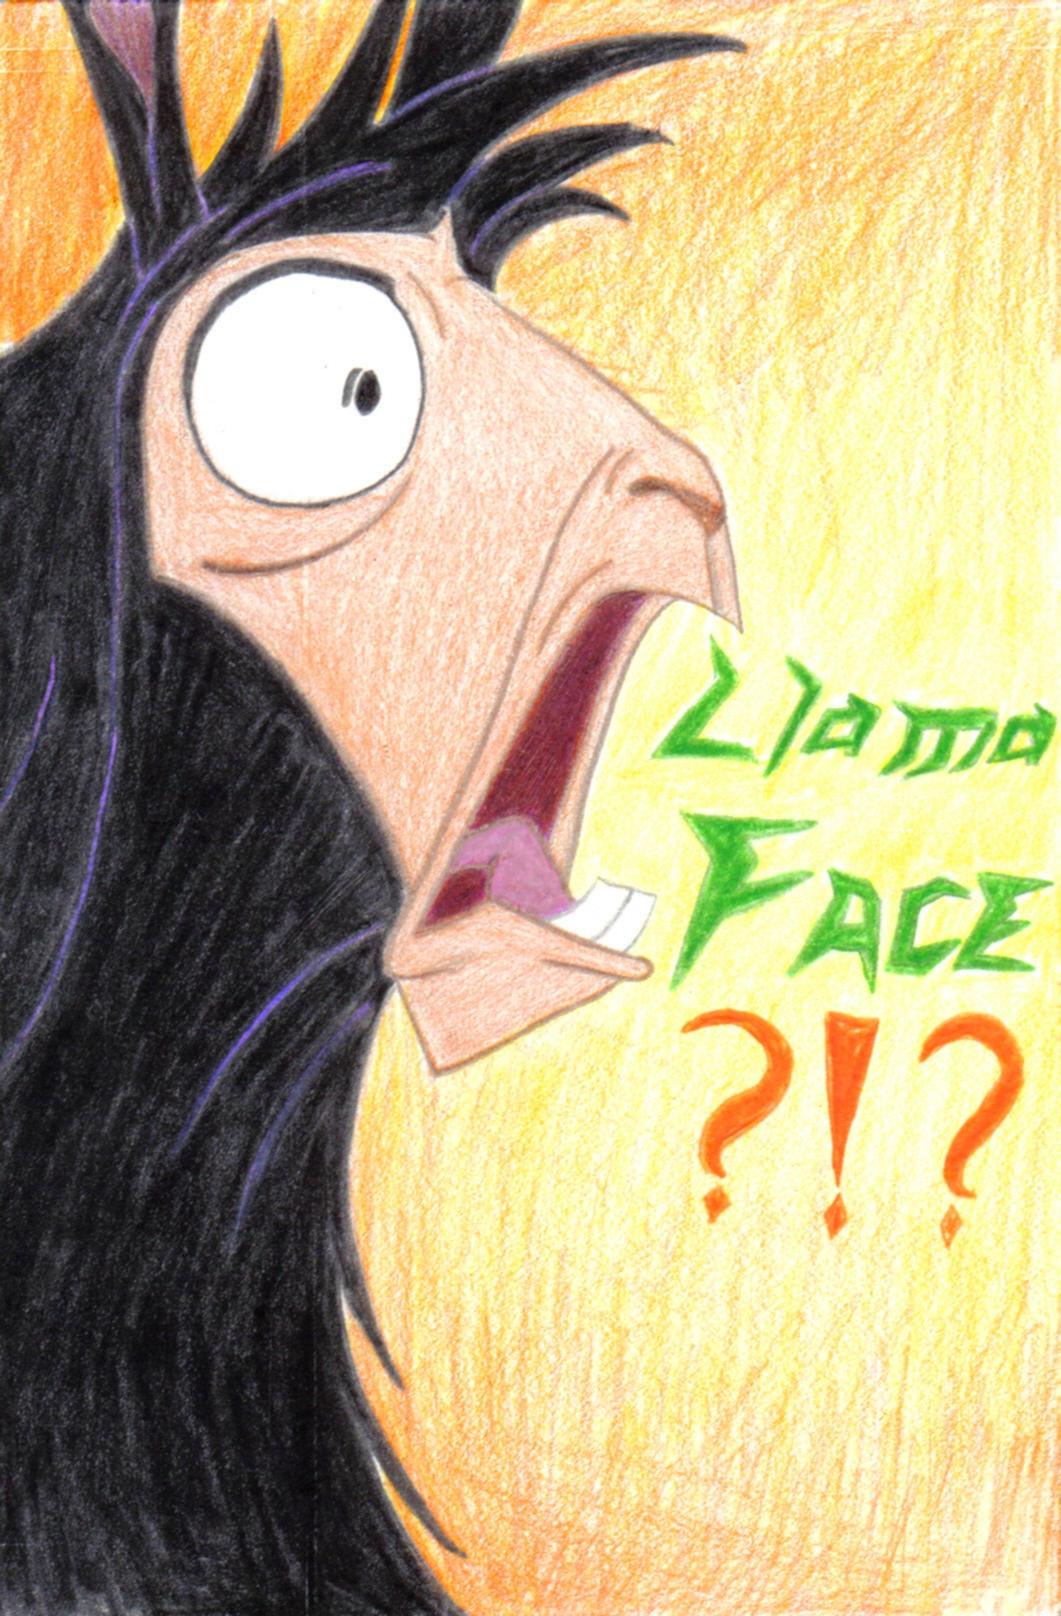 LLAMA FACE????? by lyanyne on DeviantArt